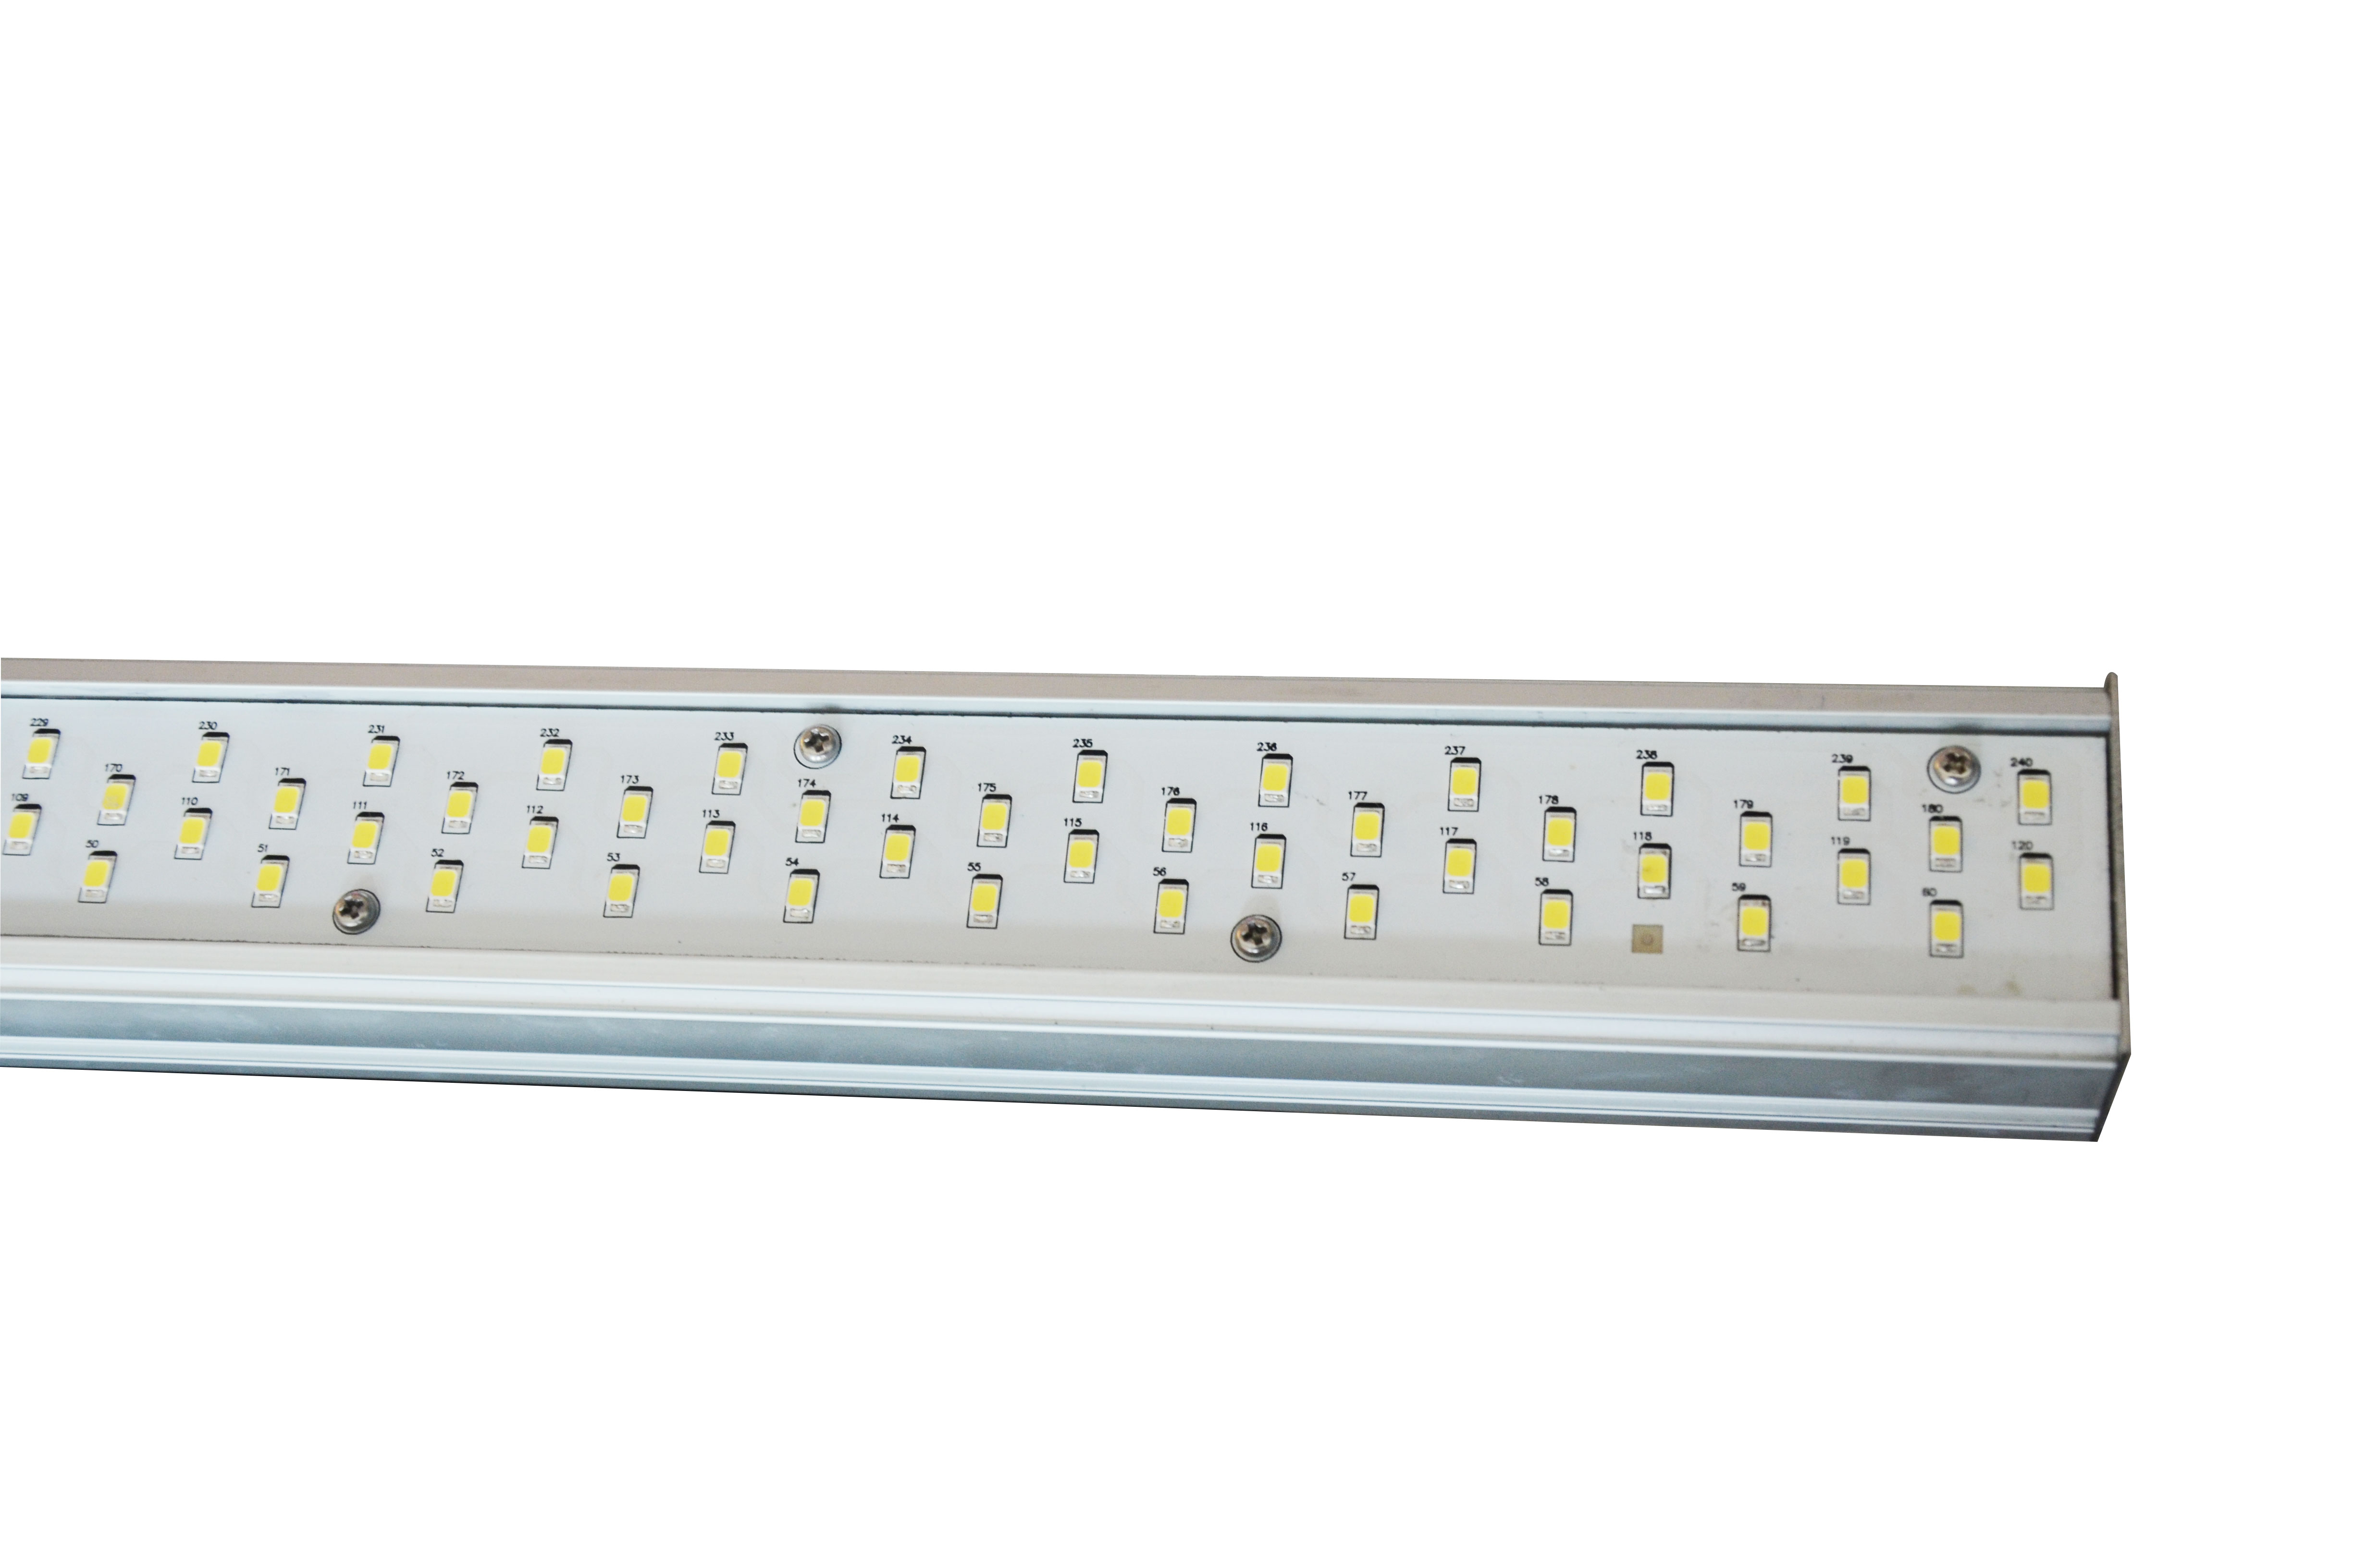 Athena X8 LED grow light bar actual power 657W full spectrum 1920pcs LEDs  4x4/ 5x5 grow tent indoor plants garden hydroponics